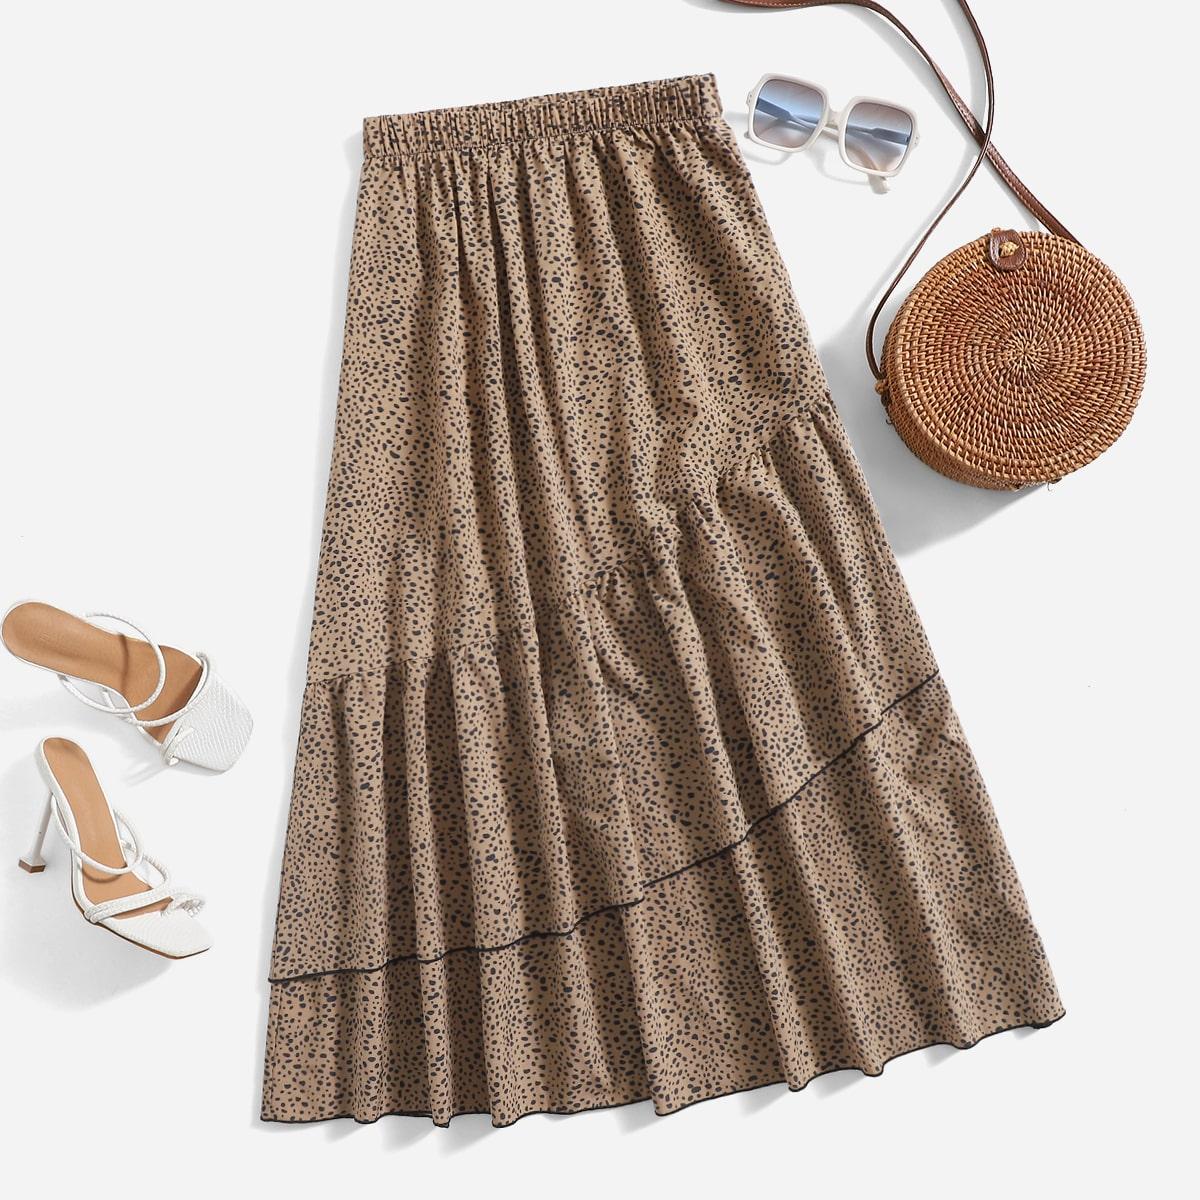 Dalmatian Print A-Line Skirt